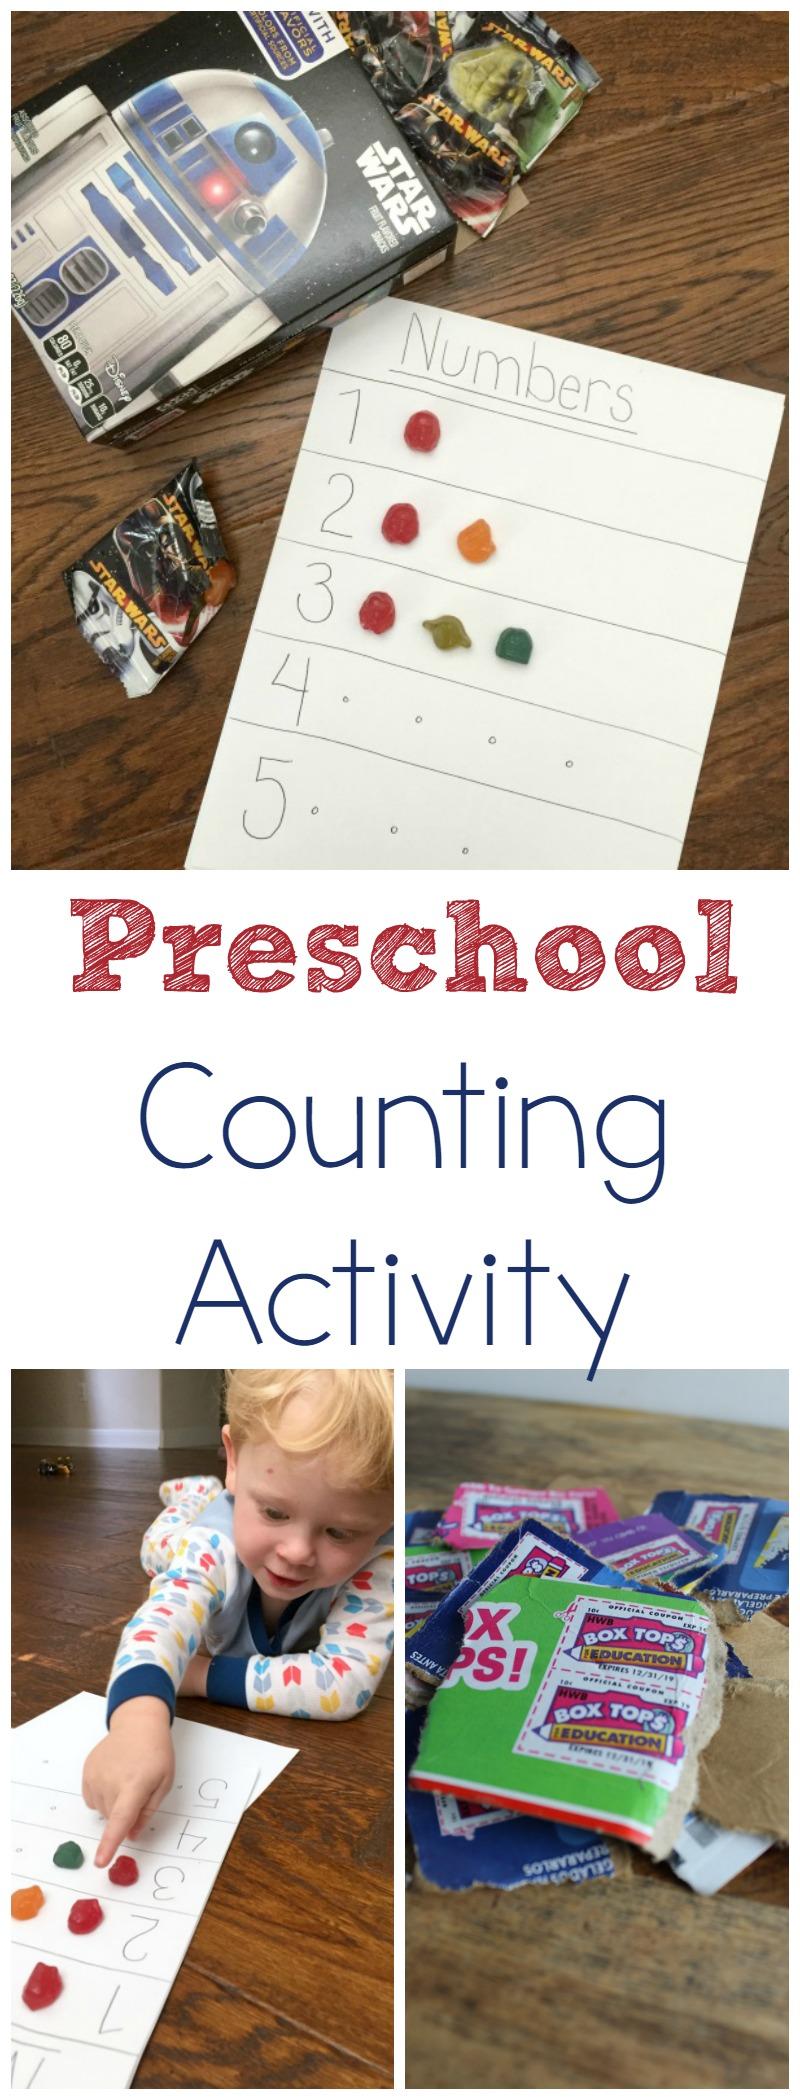 Preschool Counting Activity AD